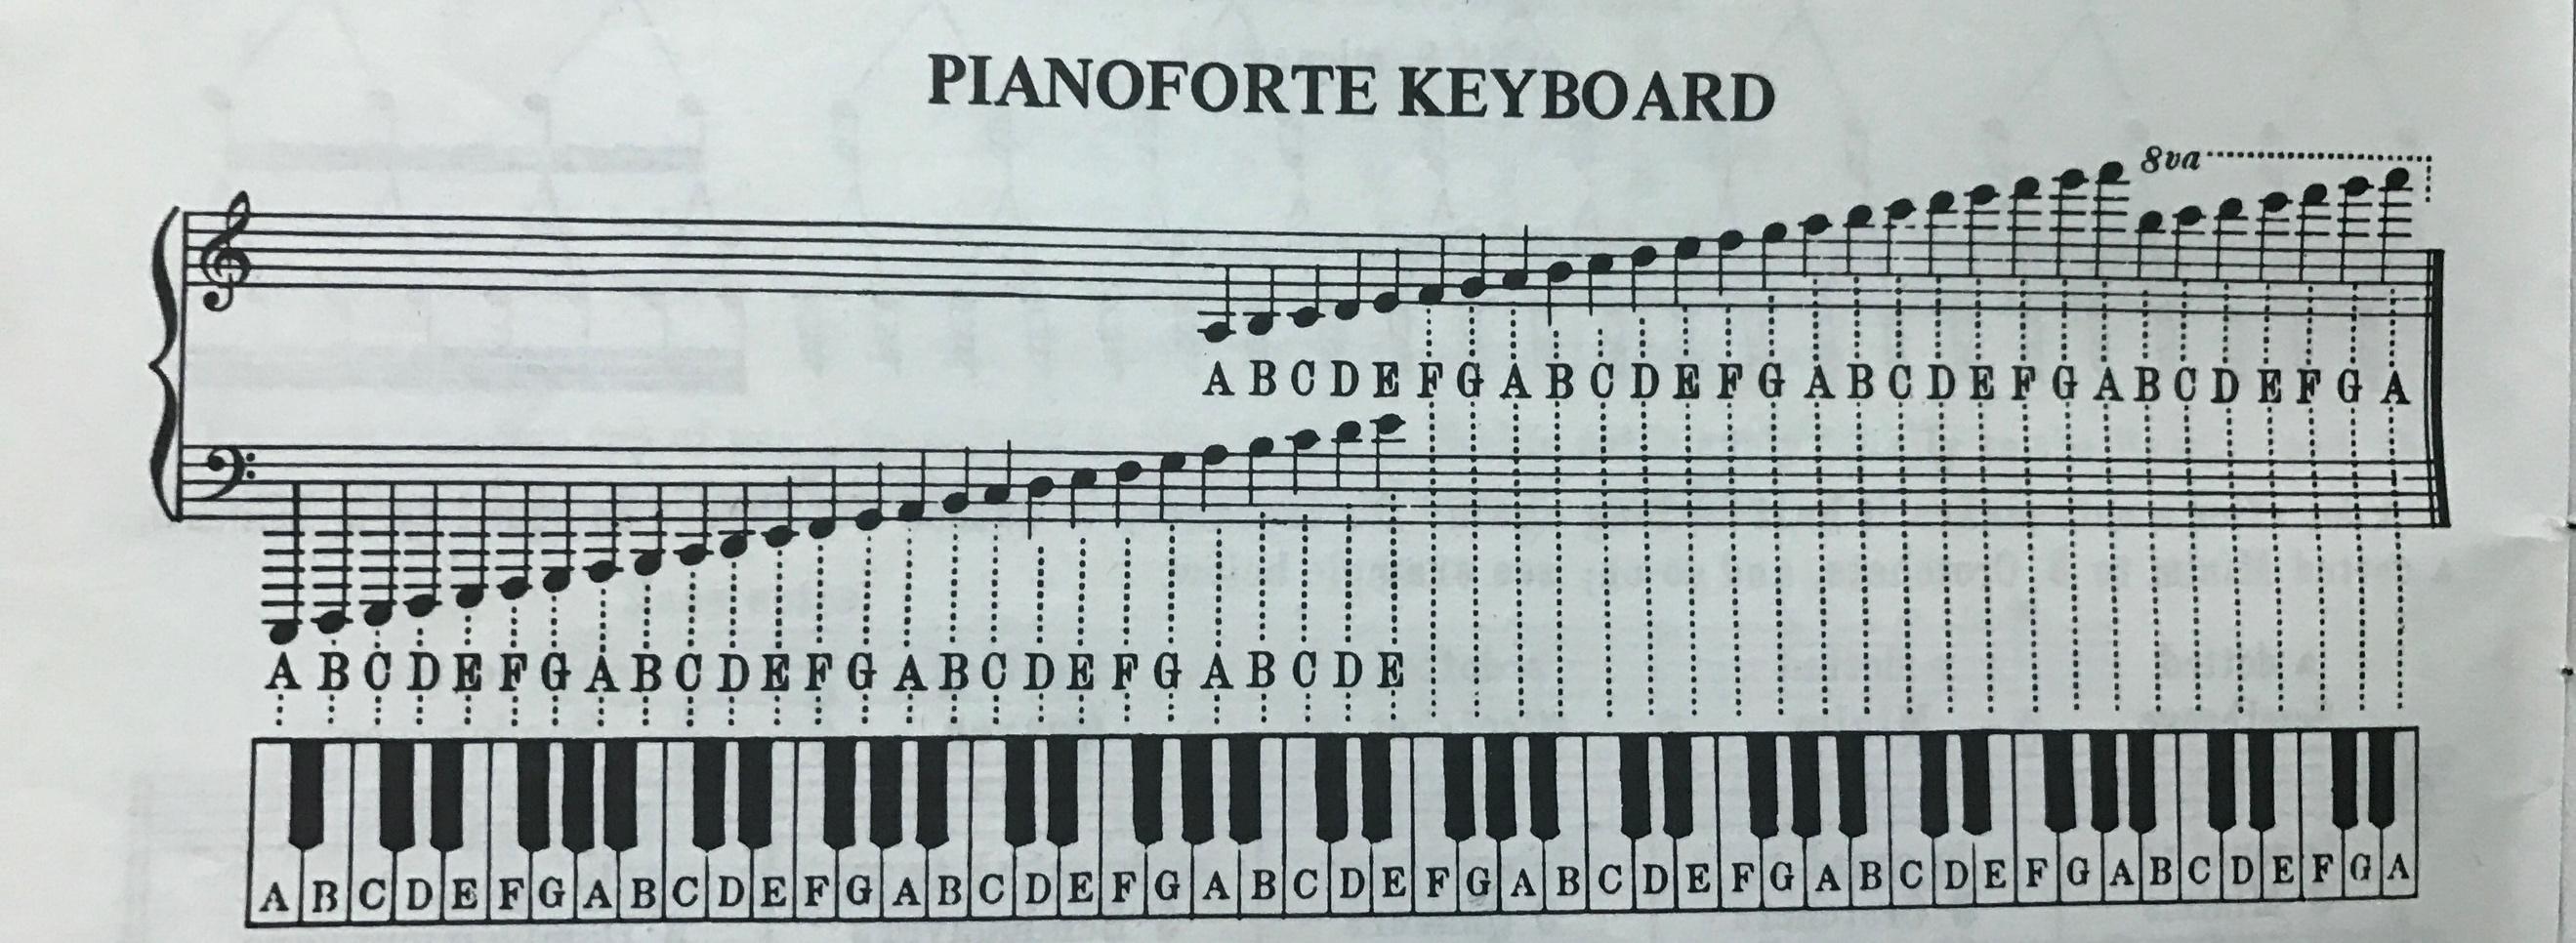 4-2%20project/pics/pianoforte.jpg